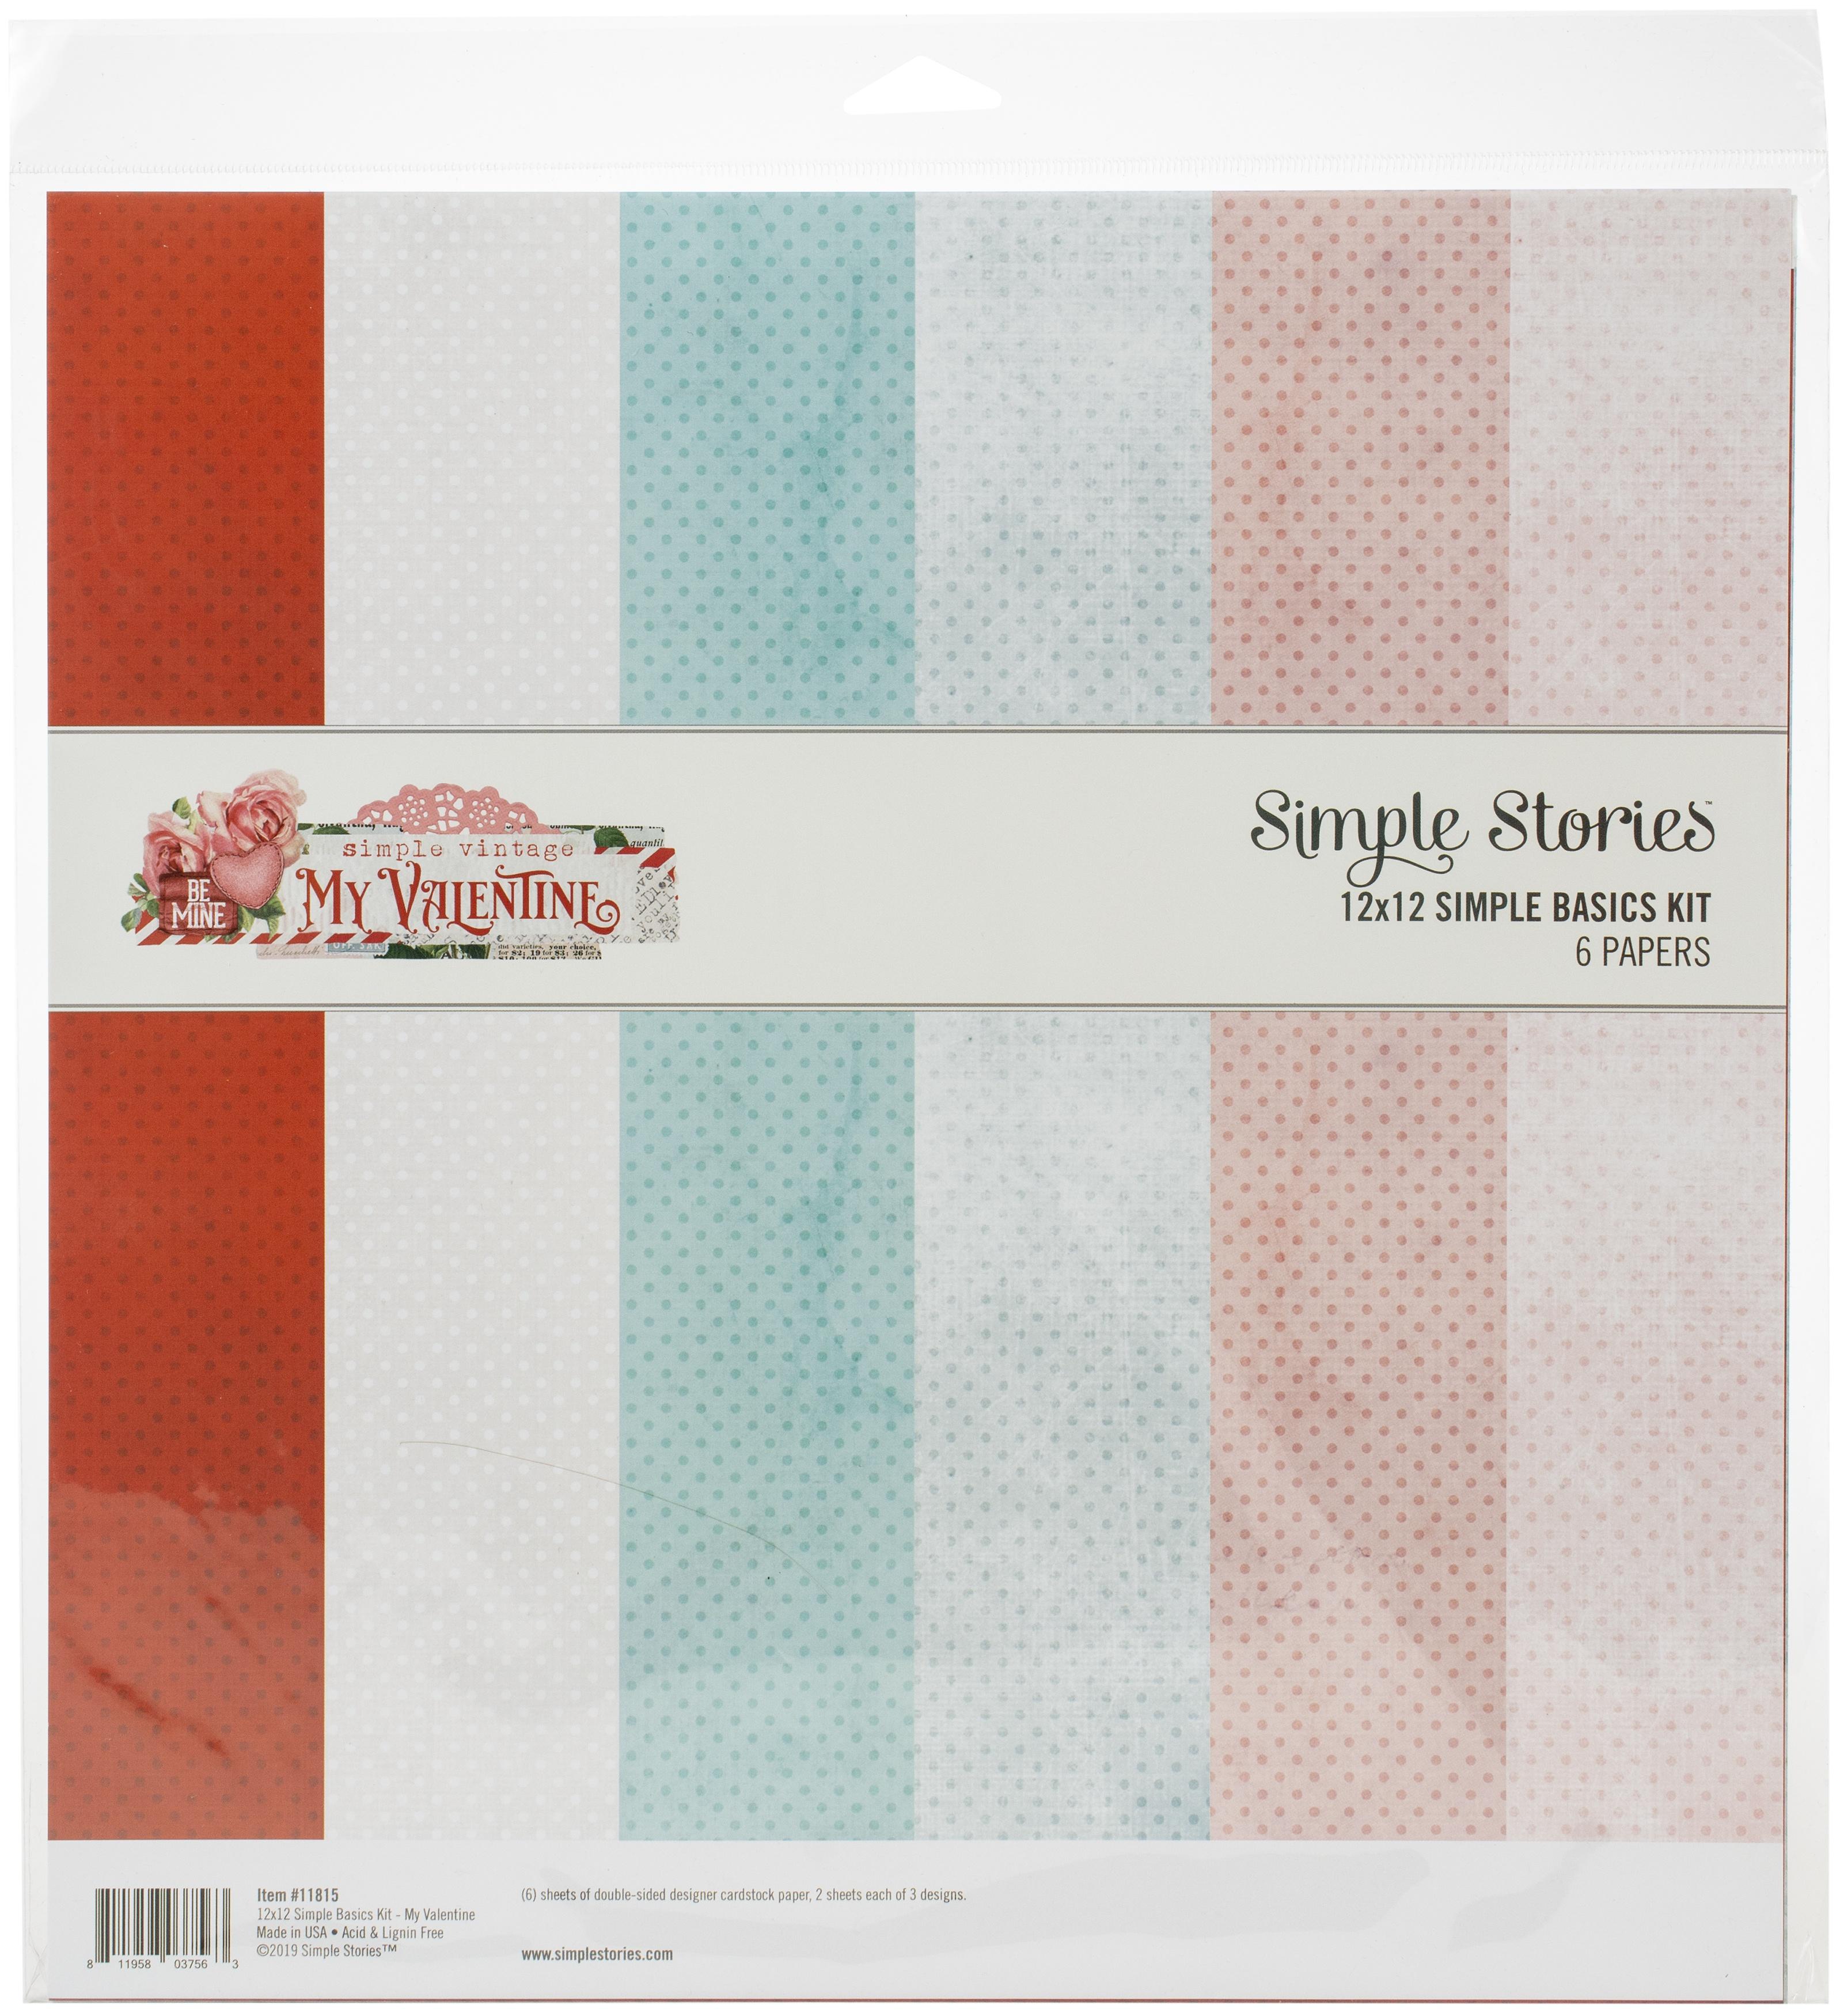 Simple Stories Basics Double-Sided Paper Pack 12X12 6/Pkg-Simple Vintage My Va...